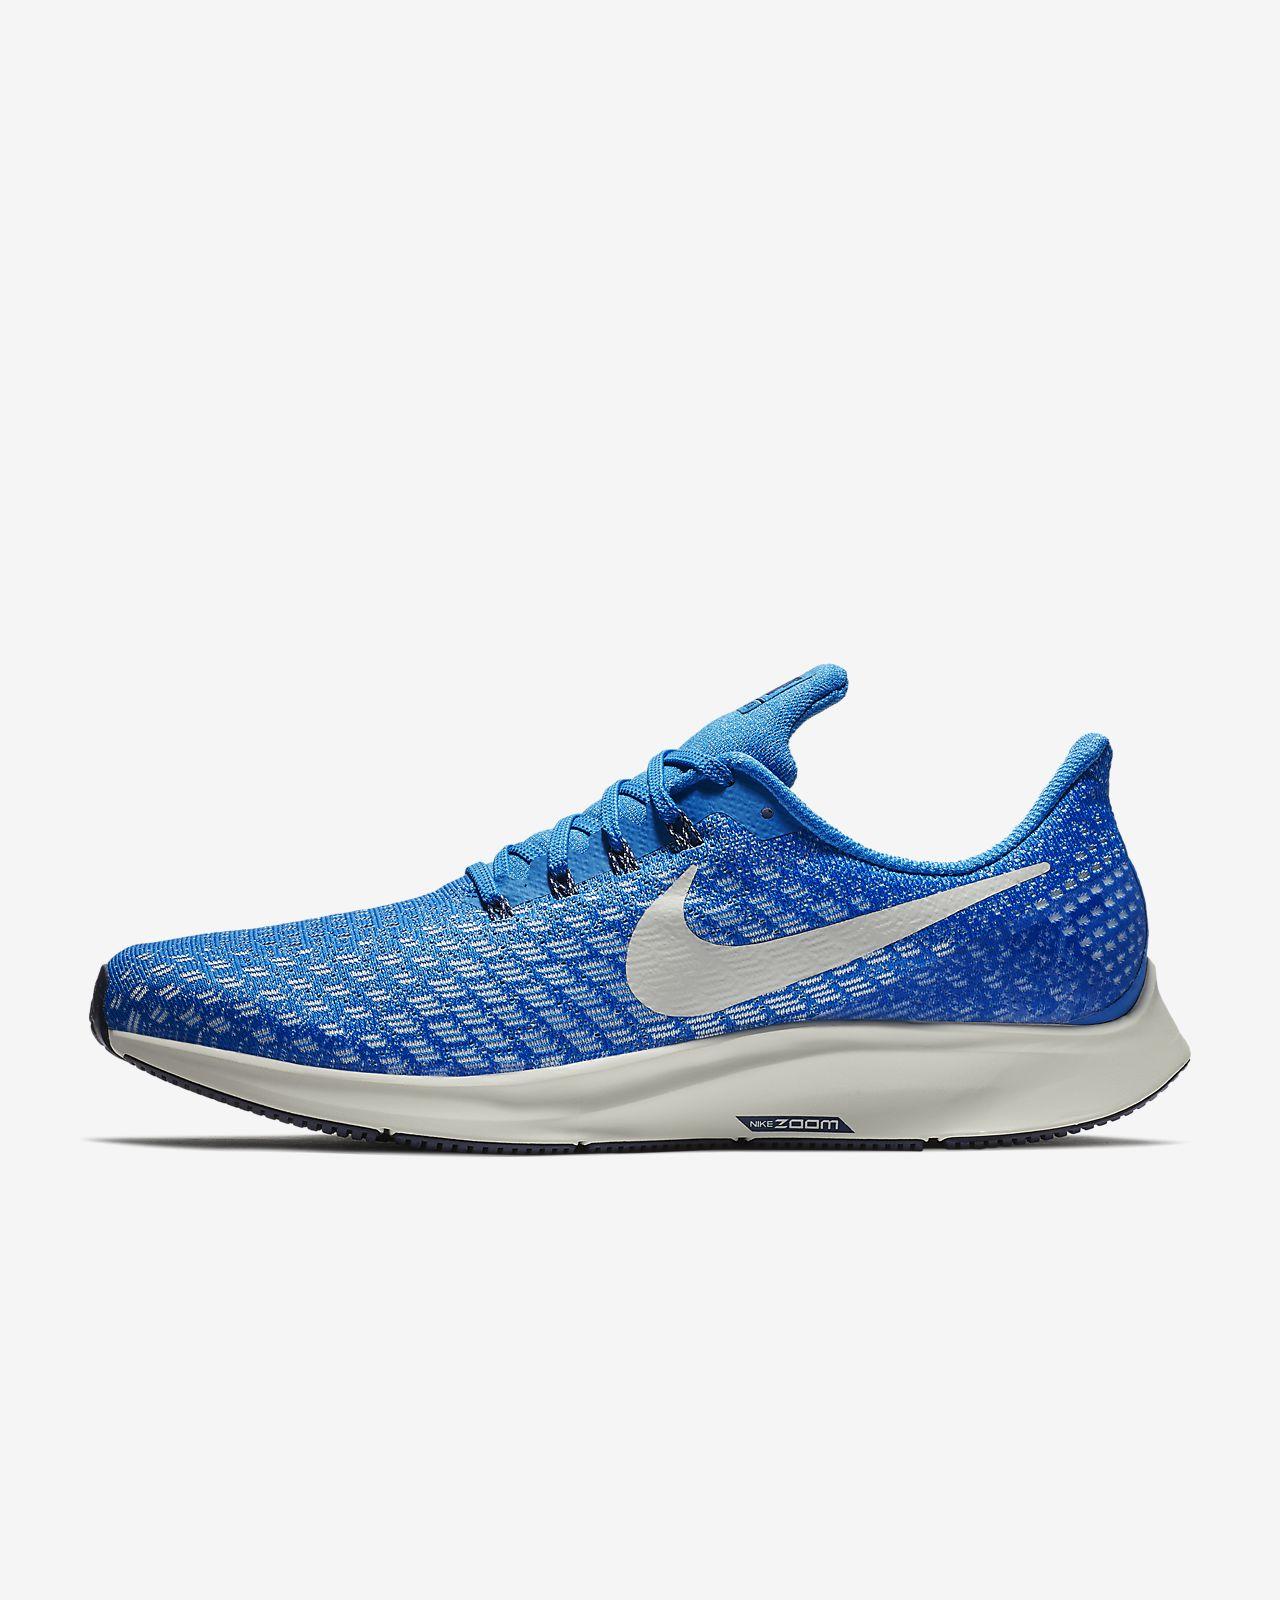 3e843e0b8 Nike Air Zoom Pegasus 35 Men's Running Shoe. Nike.com